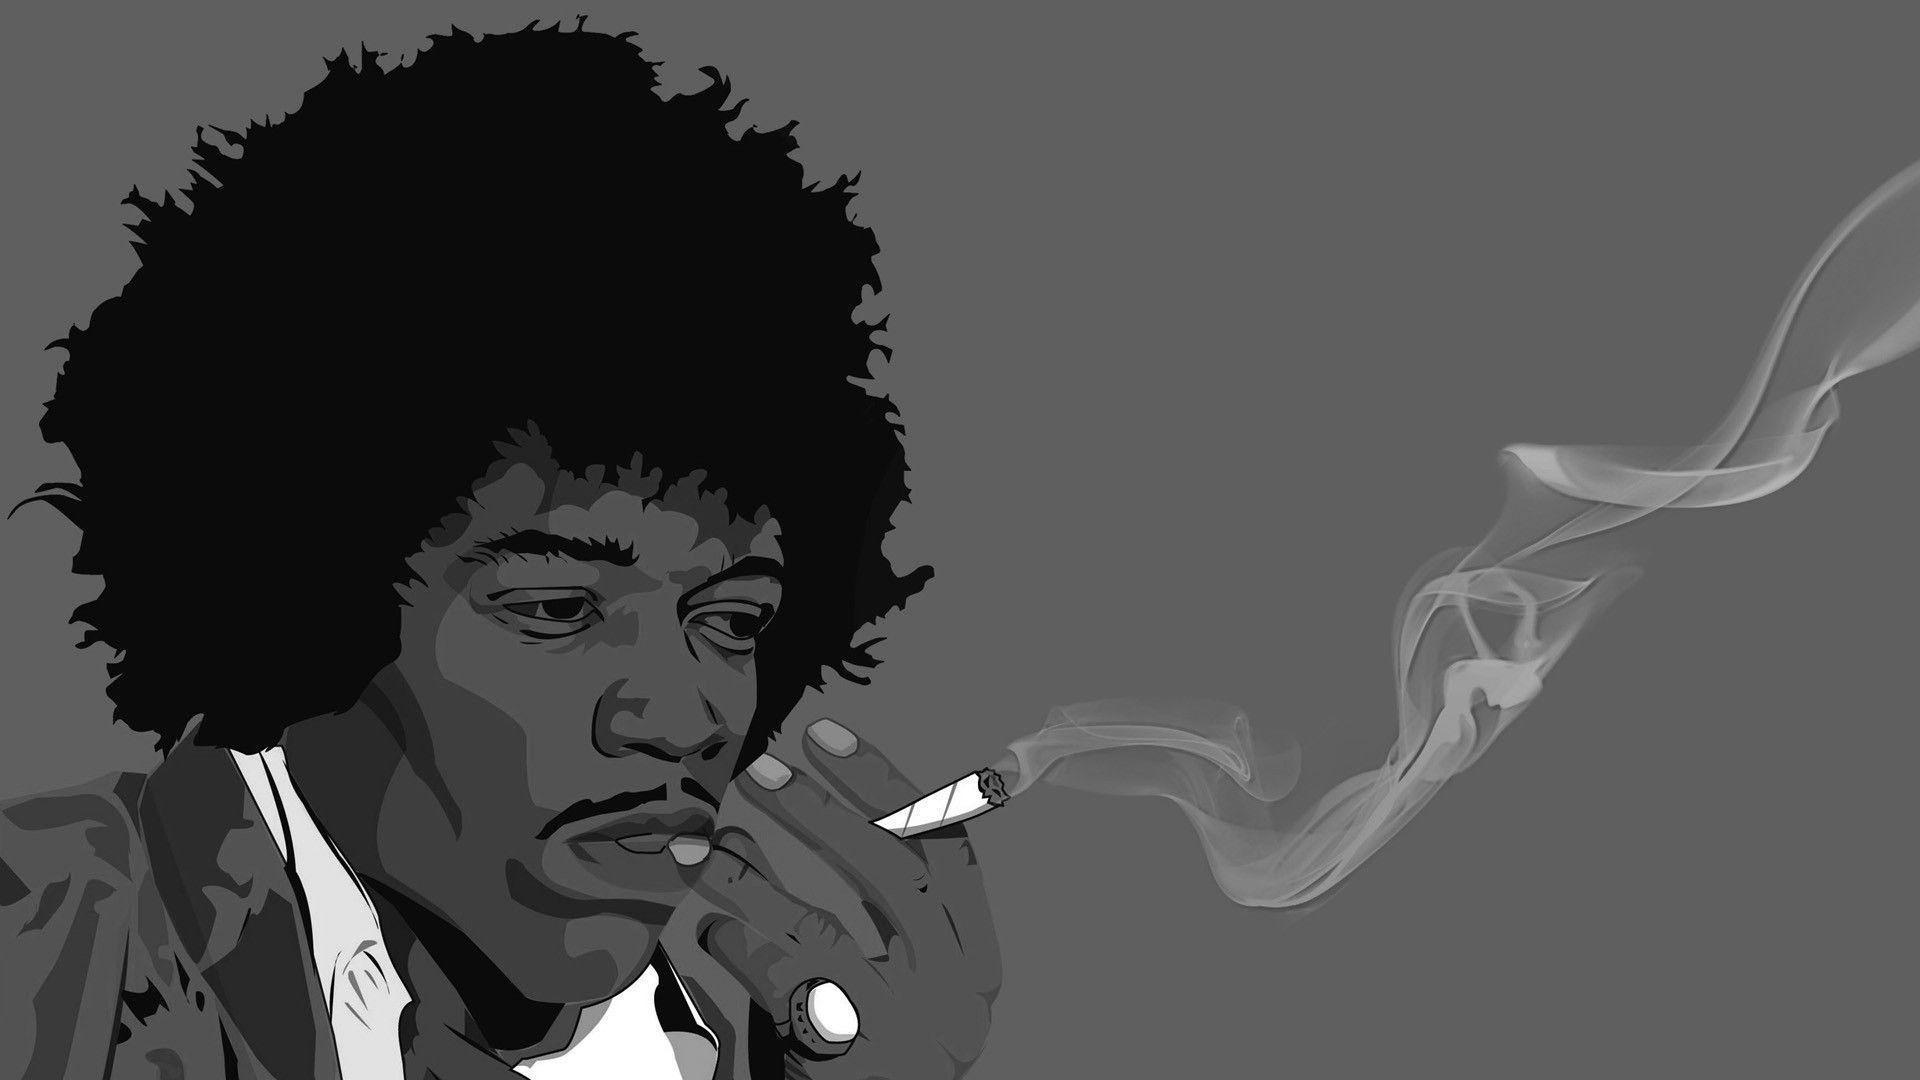 Jimi Hendrix Wallpapers Top Free Jimi Hendrix Backgrounds